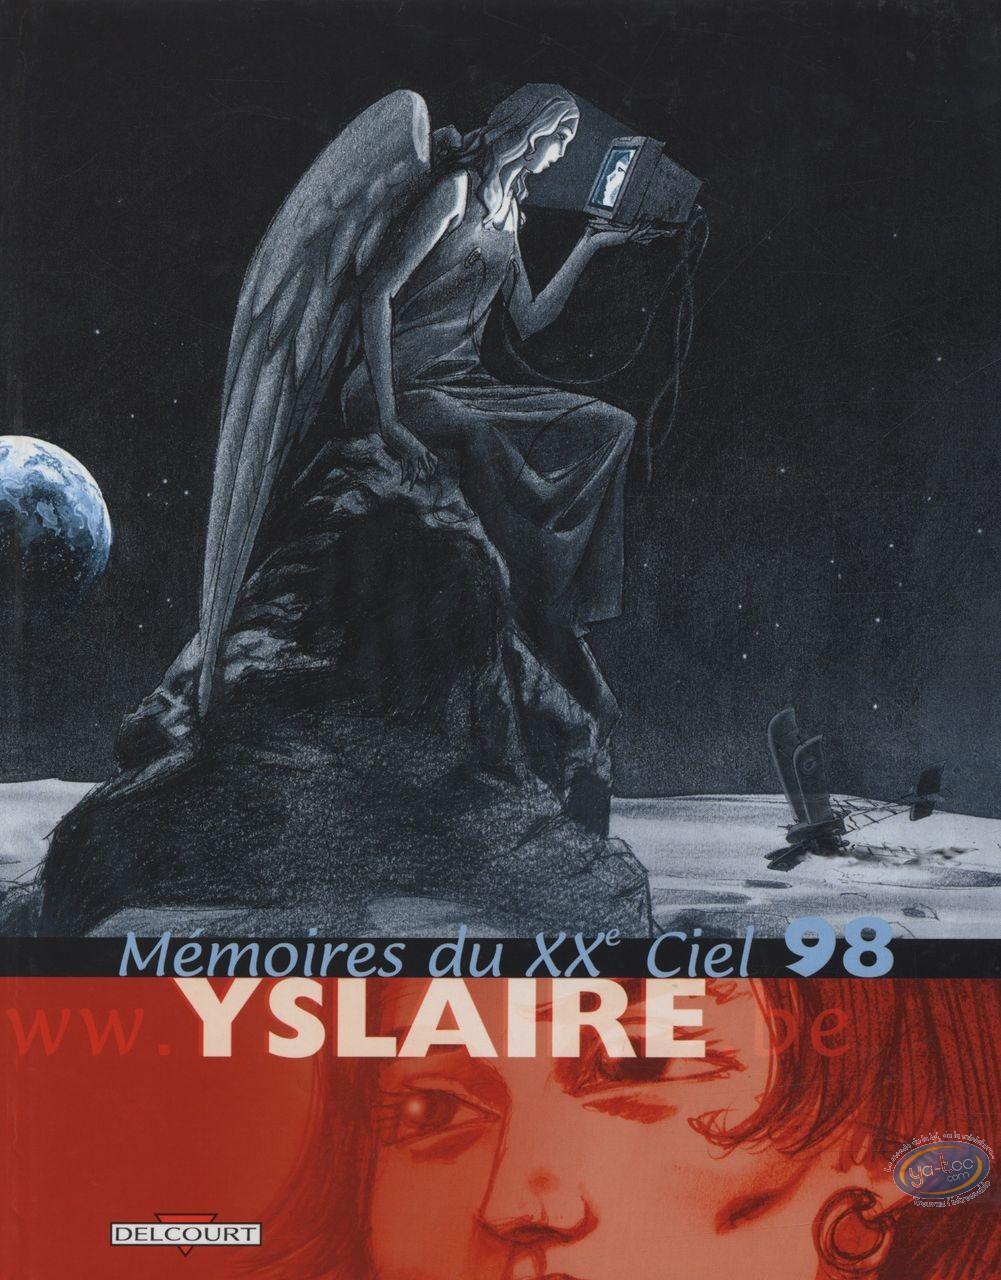 Used European Comic Books, Mémoires du XXe Ciel : Mémoires du Xxe Ciel